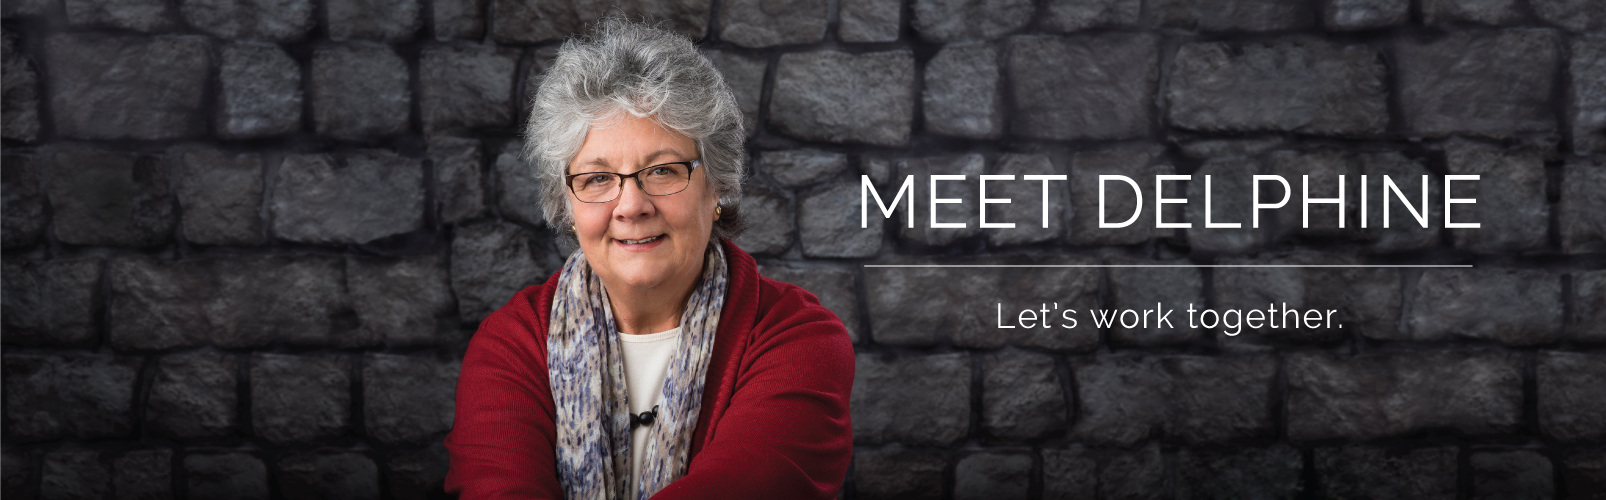 Meet Delphine du Toit, Halifax, NS Mediator, Conflict Coach, and Workshop Facilitator